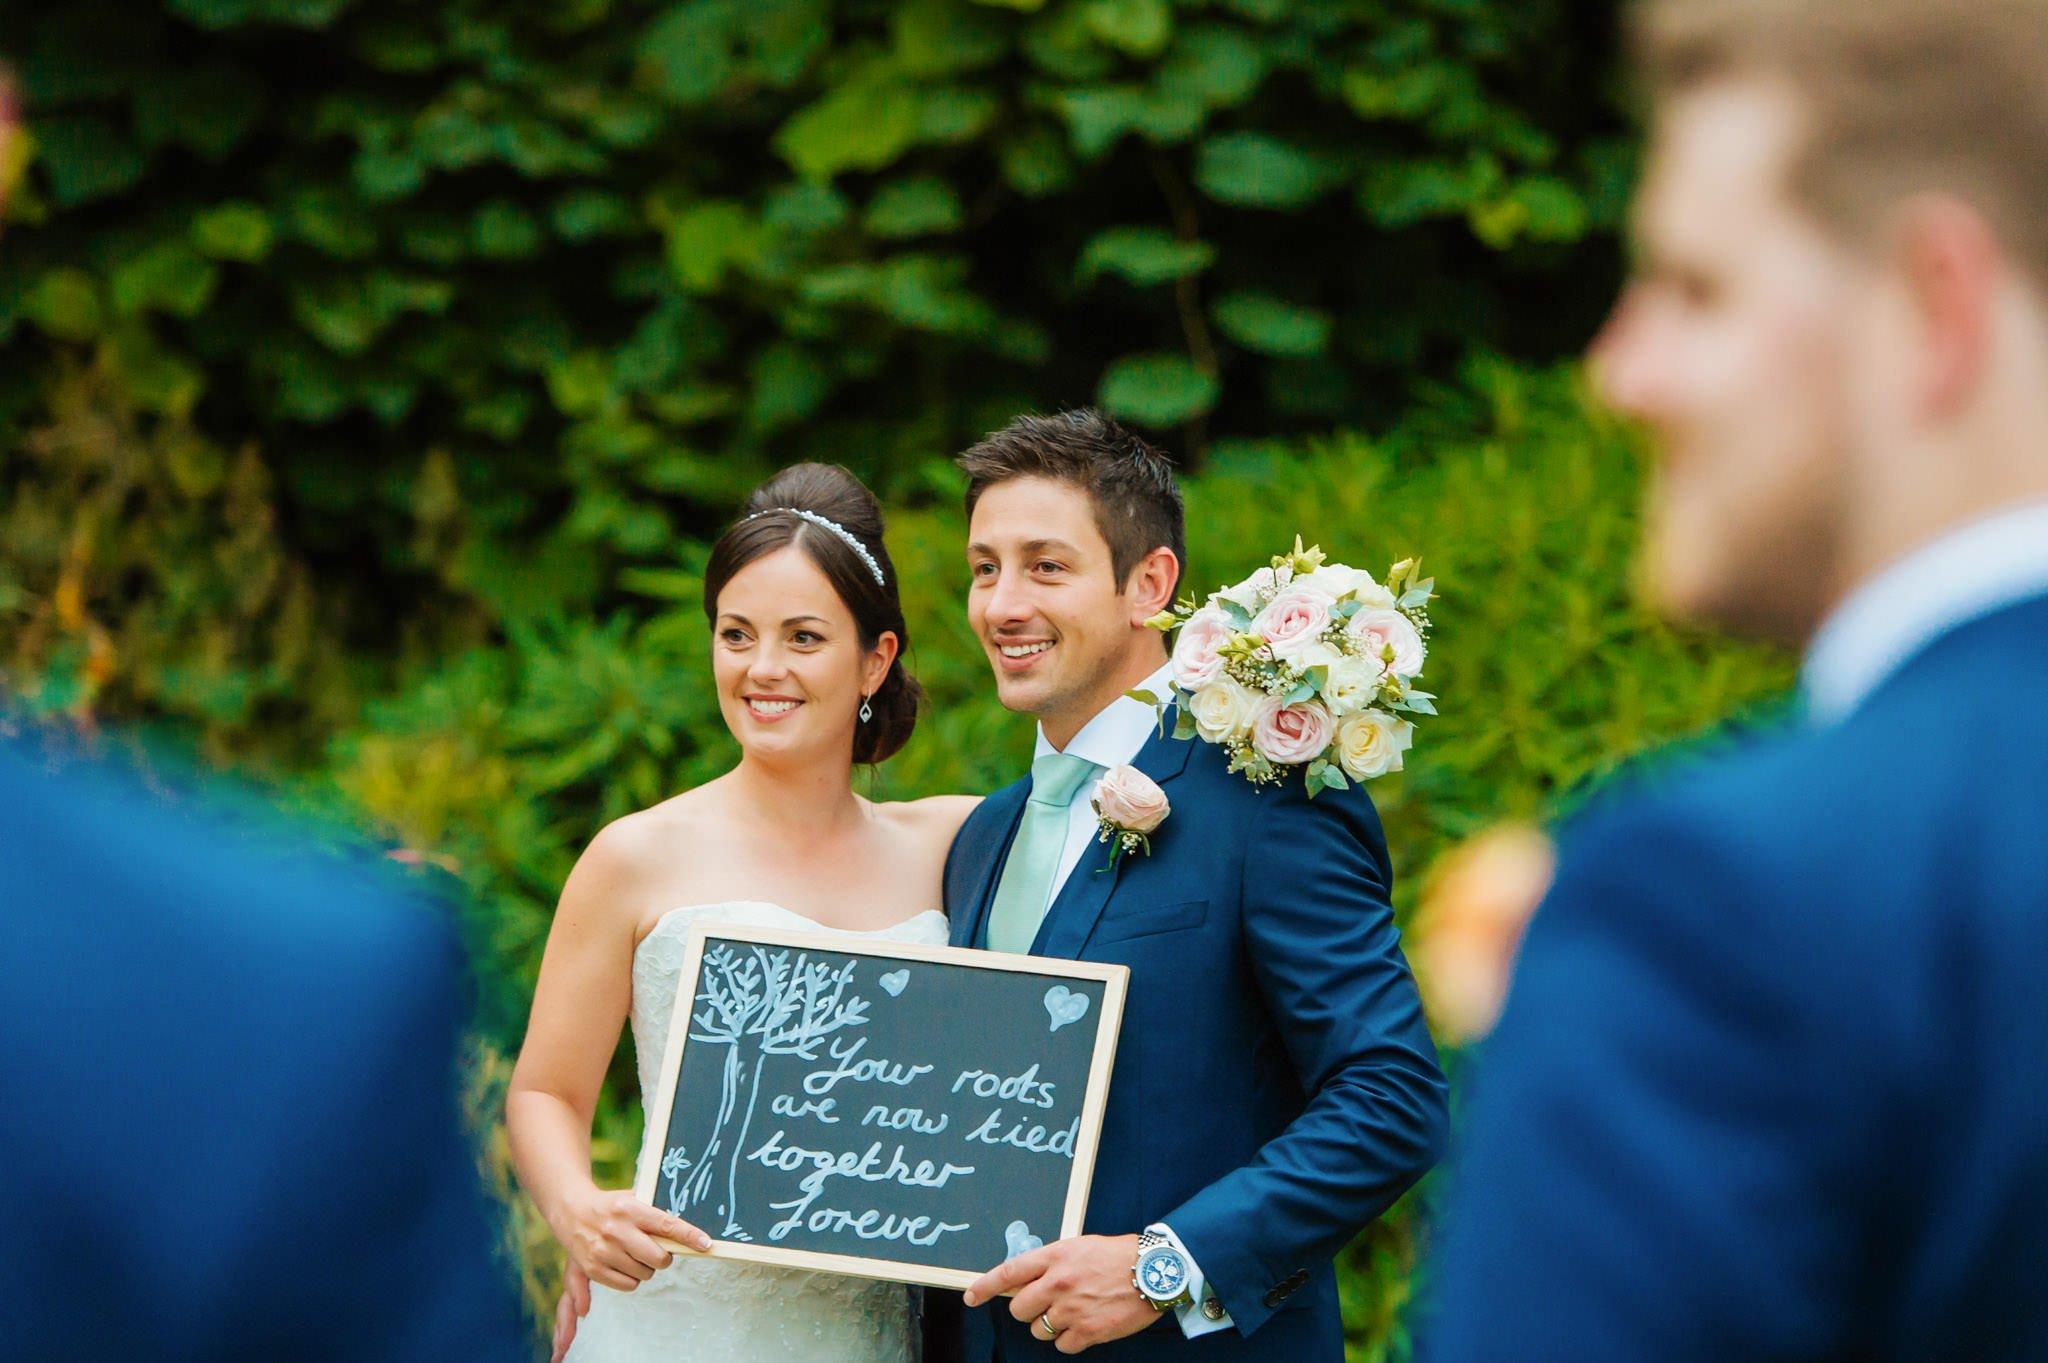 Eastnor Castle wedding photographer Herefordshire, West Midlands - Sarah + Dean 41